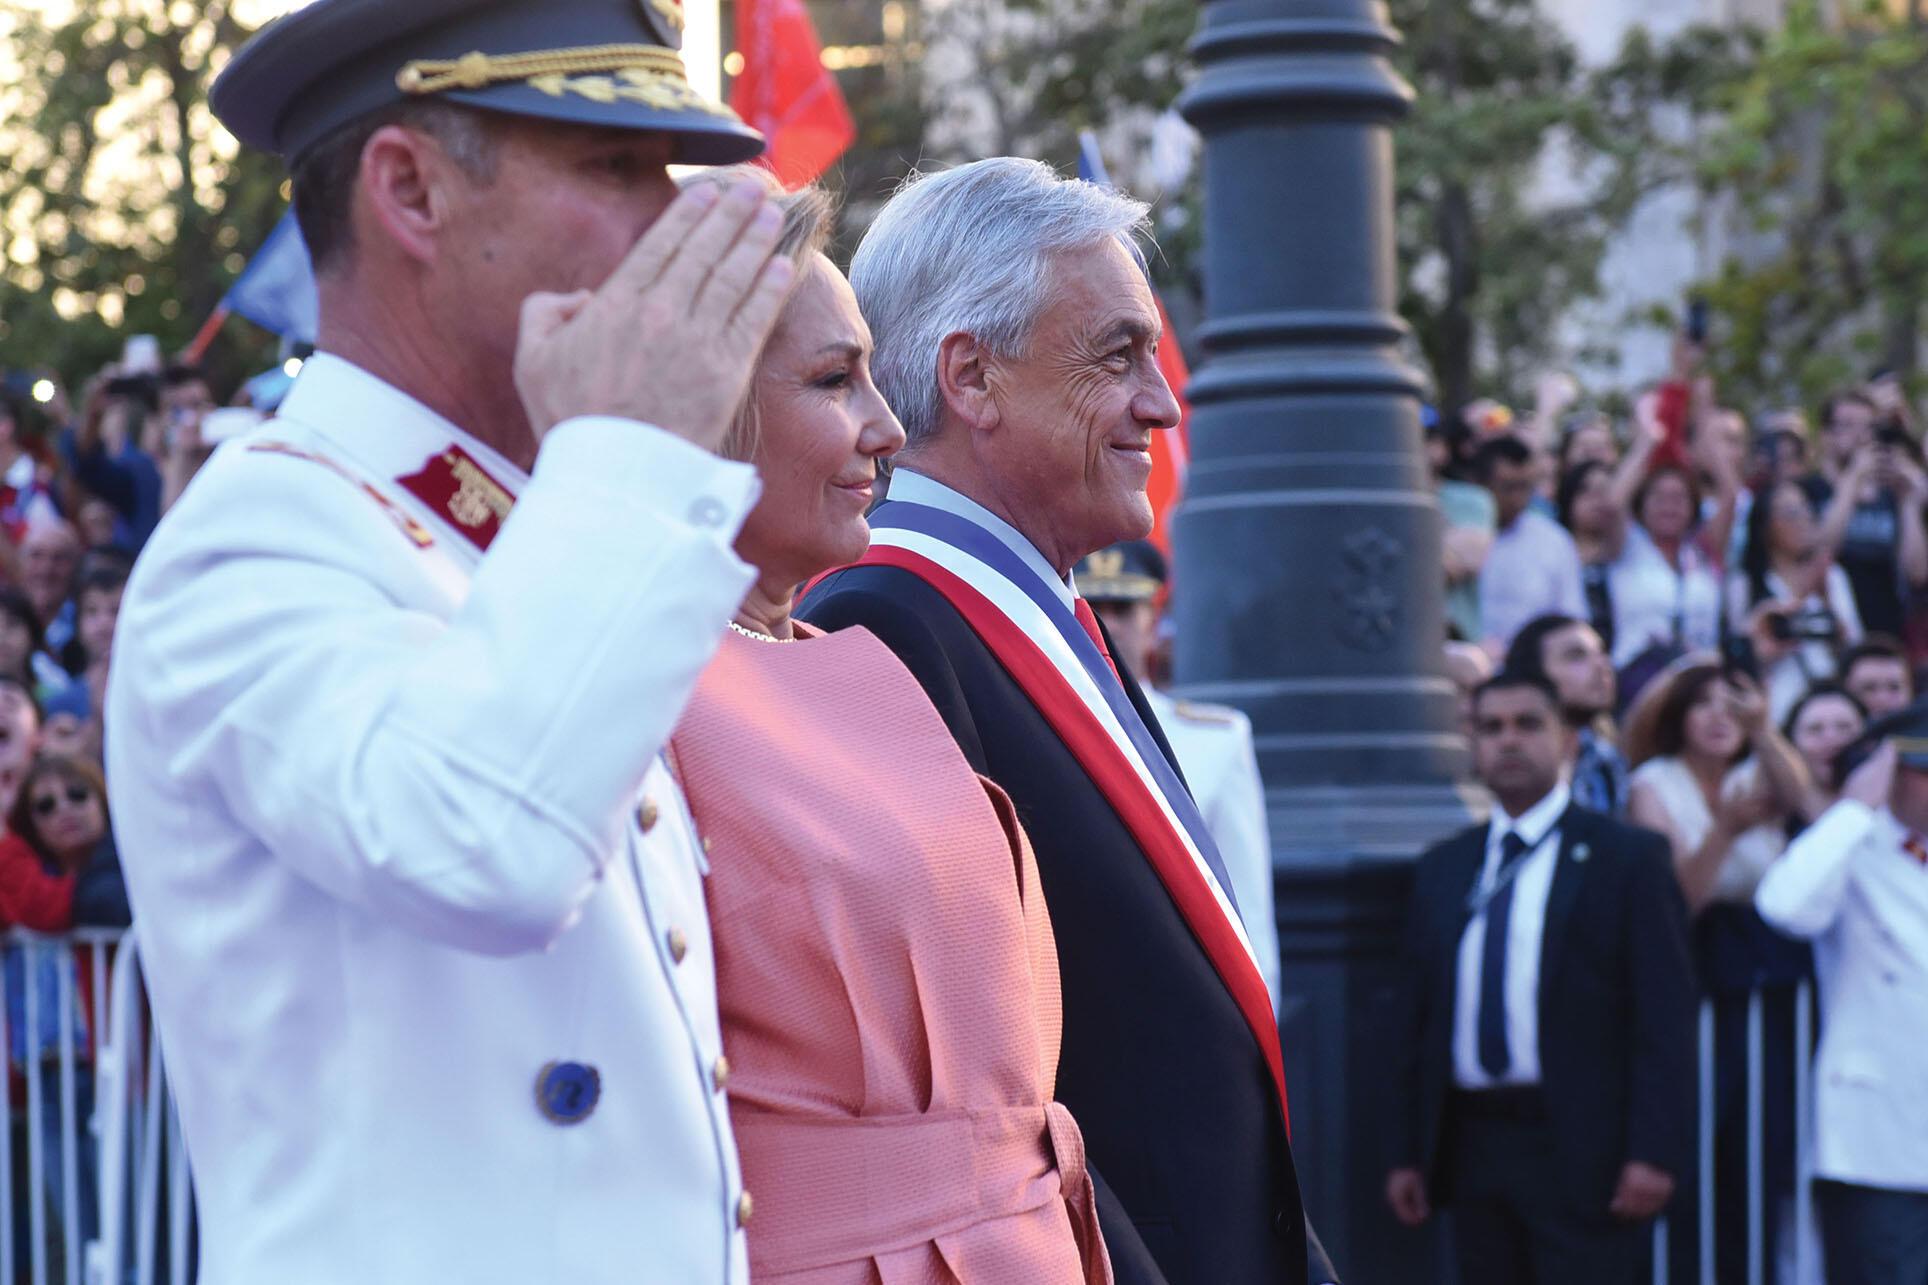 Sebastian Piñera takes office as President of Chile, January 2018. (Photo by Ministerio Secretaría General de Gobierno.)